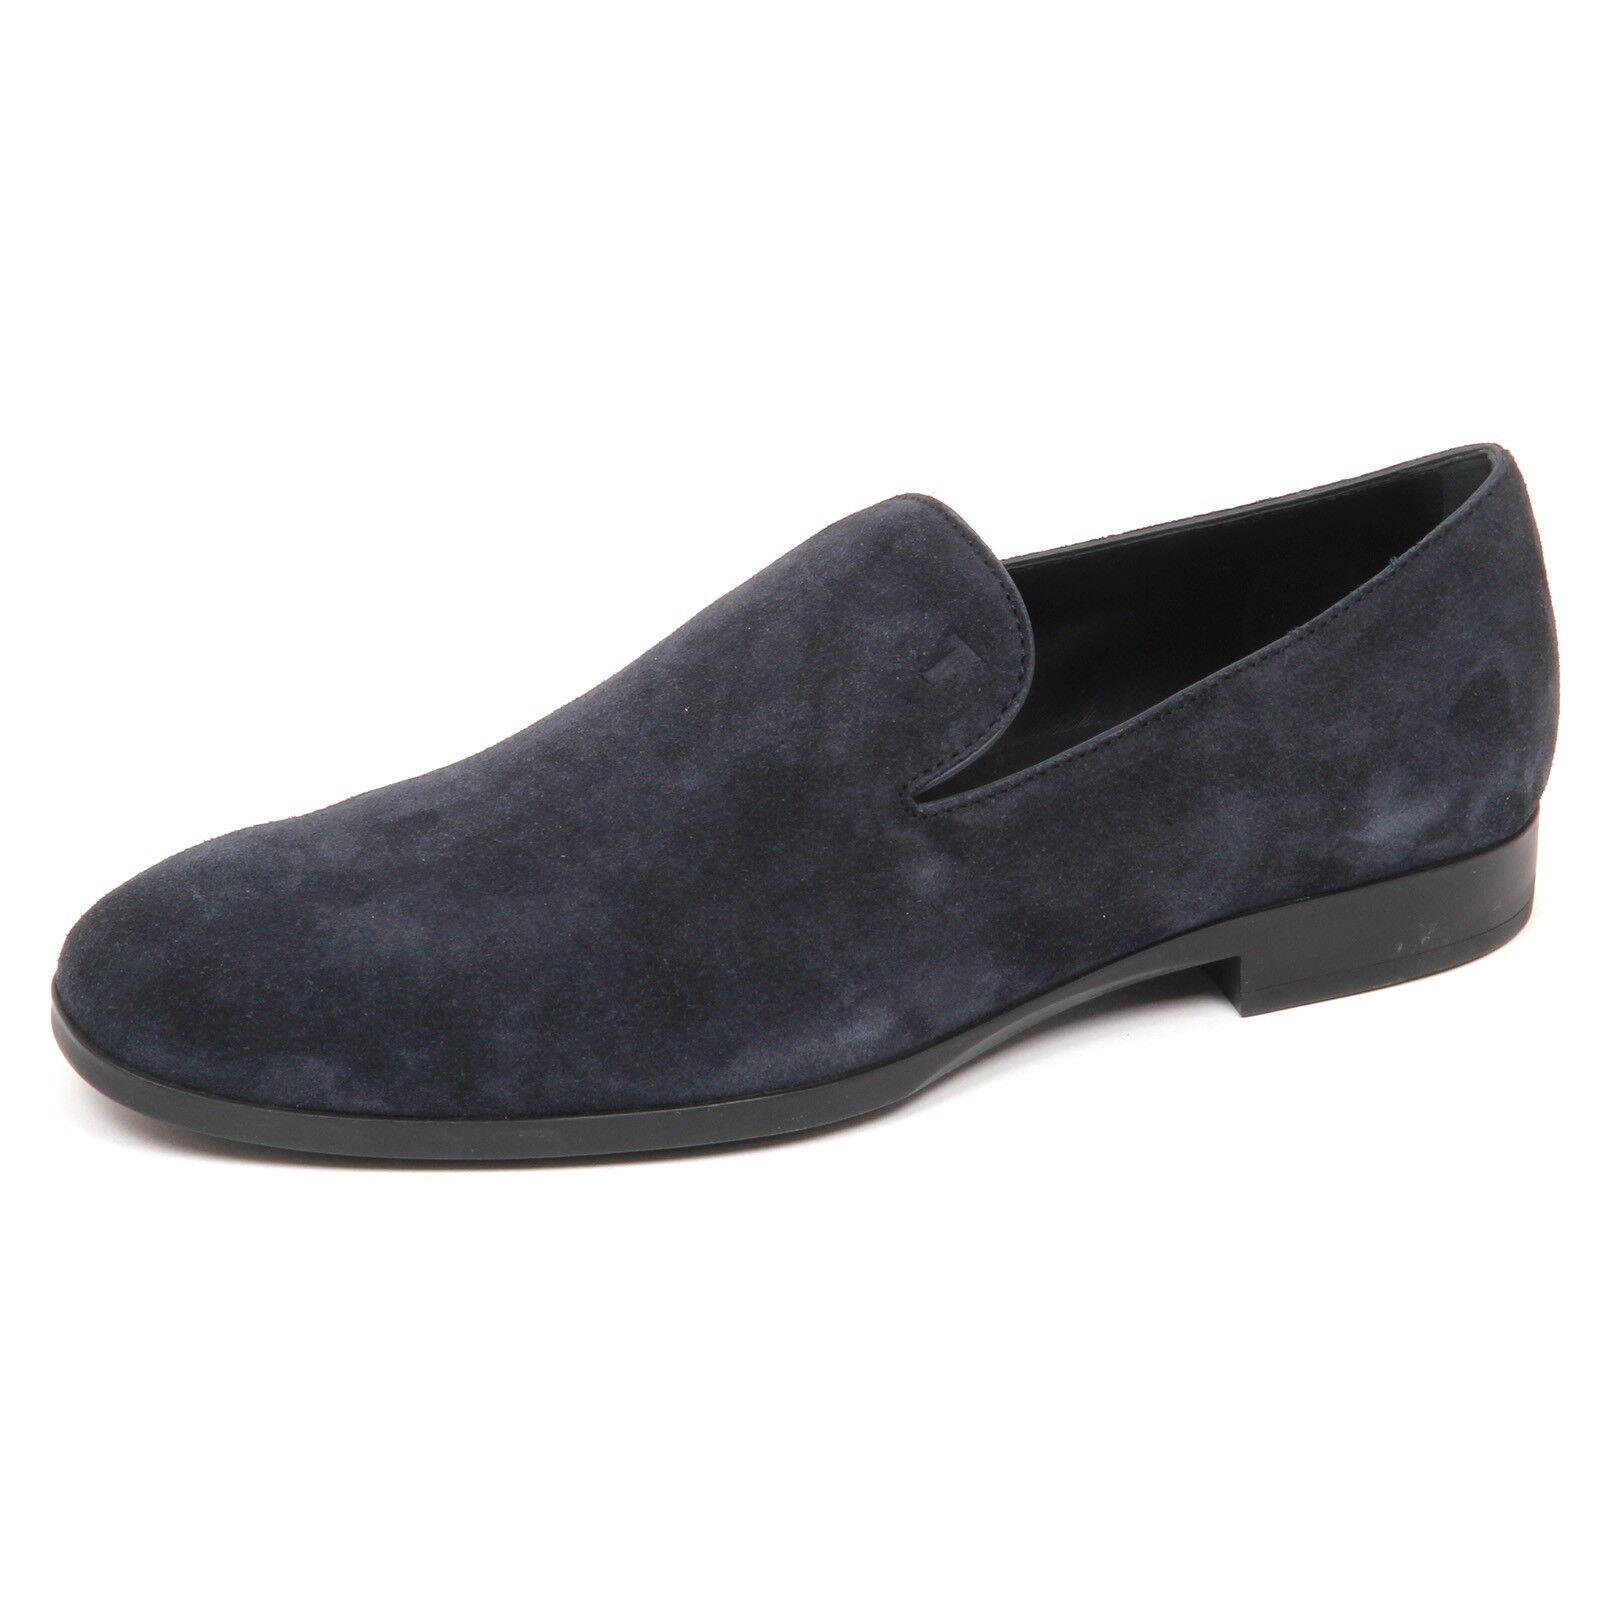 E2858 mocassino uomo blu TOD'S scarpe loafer shoe man